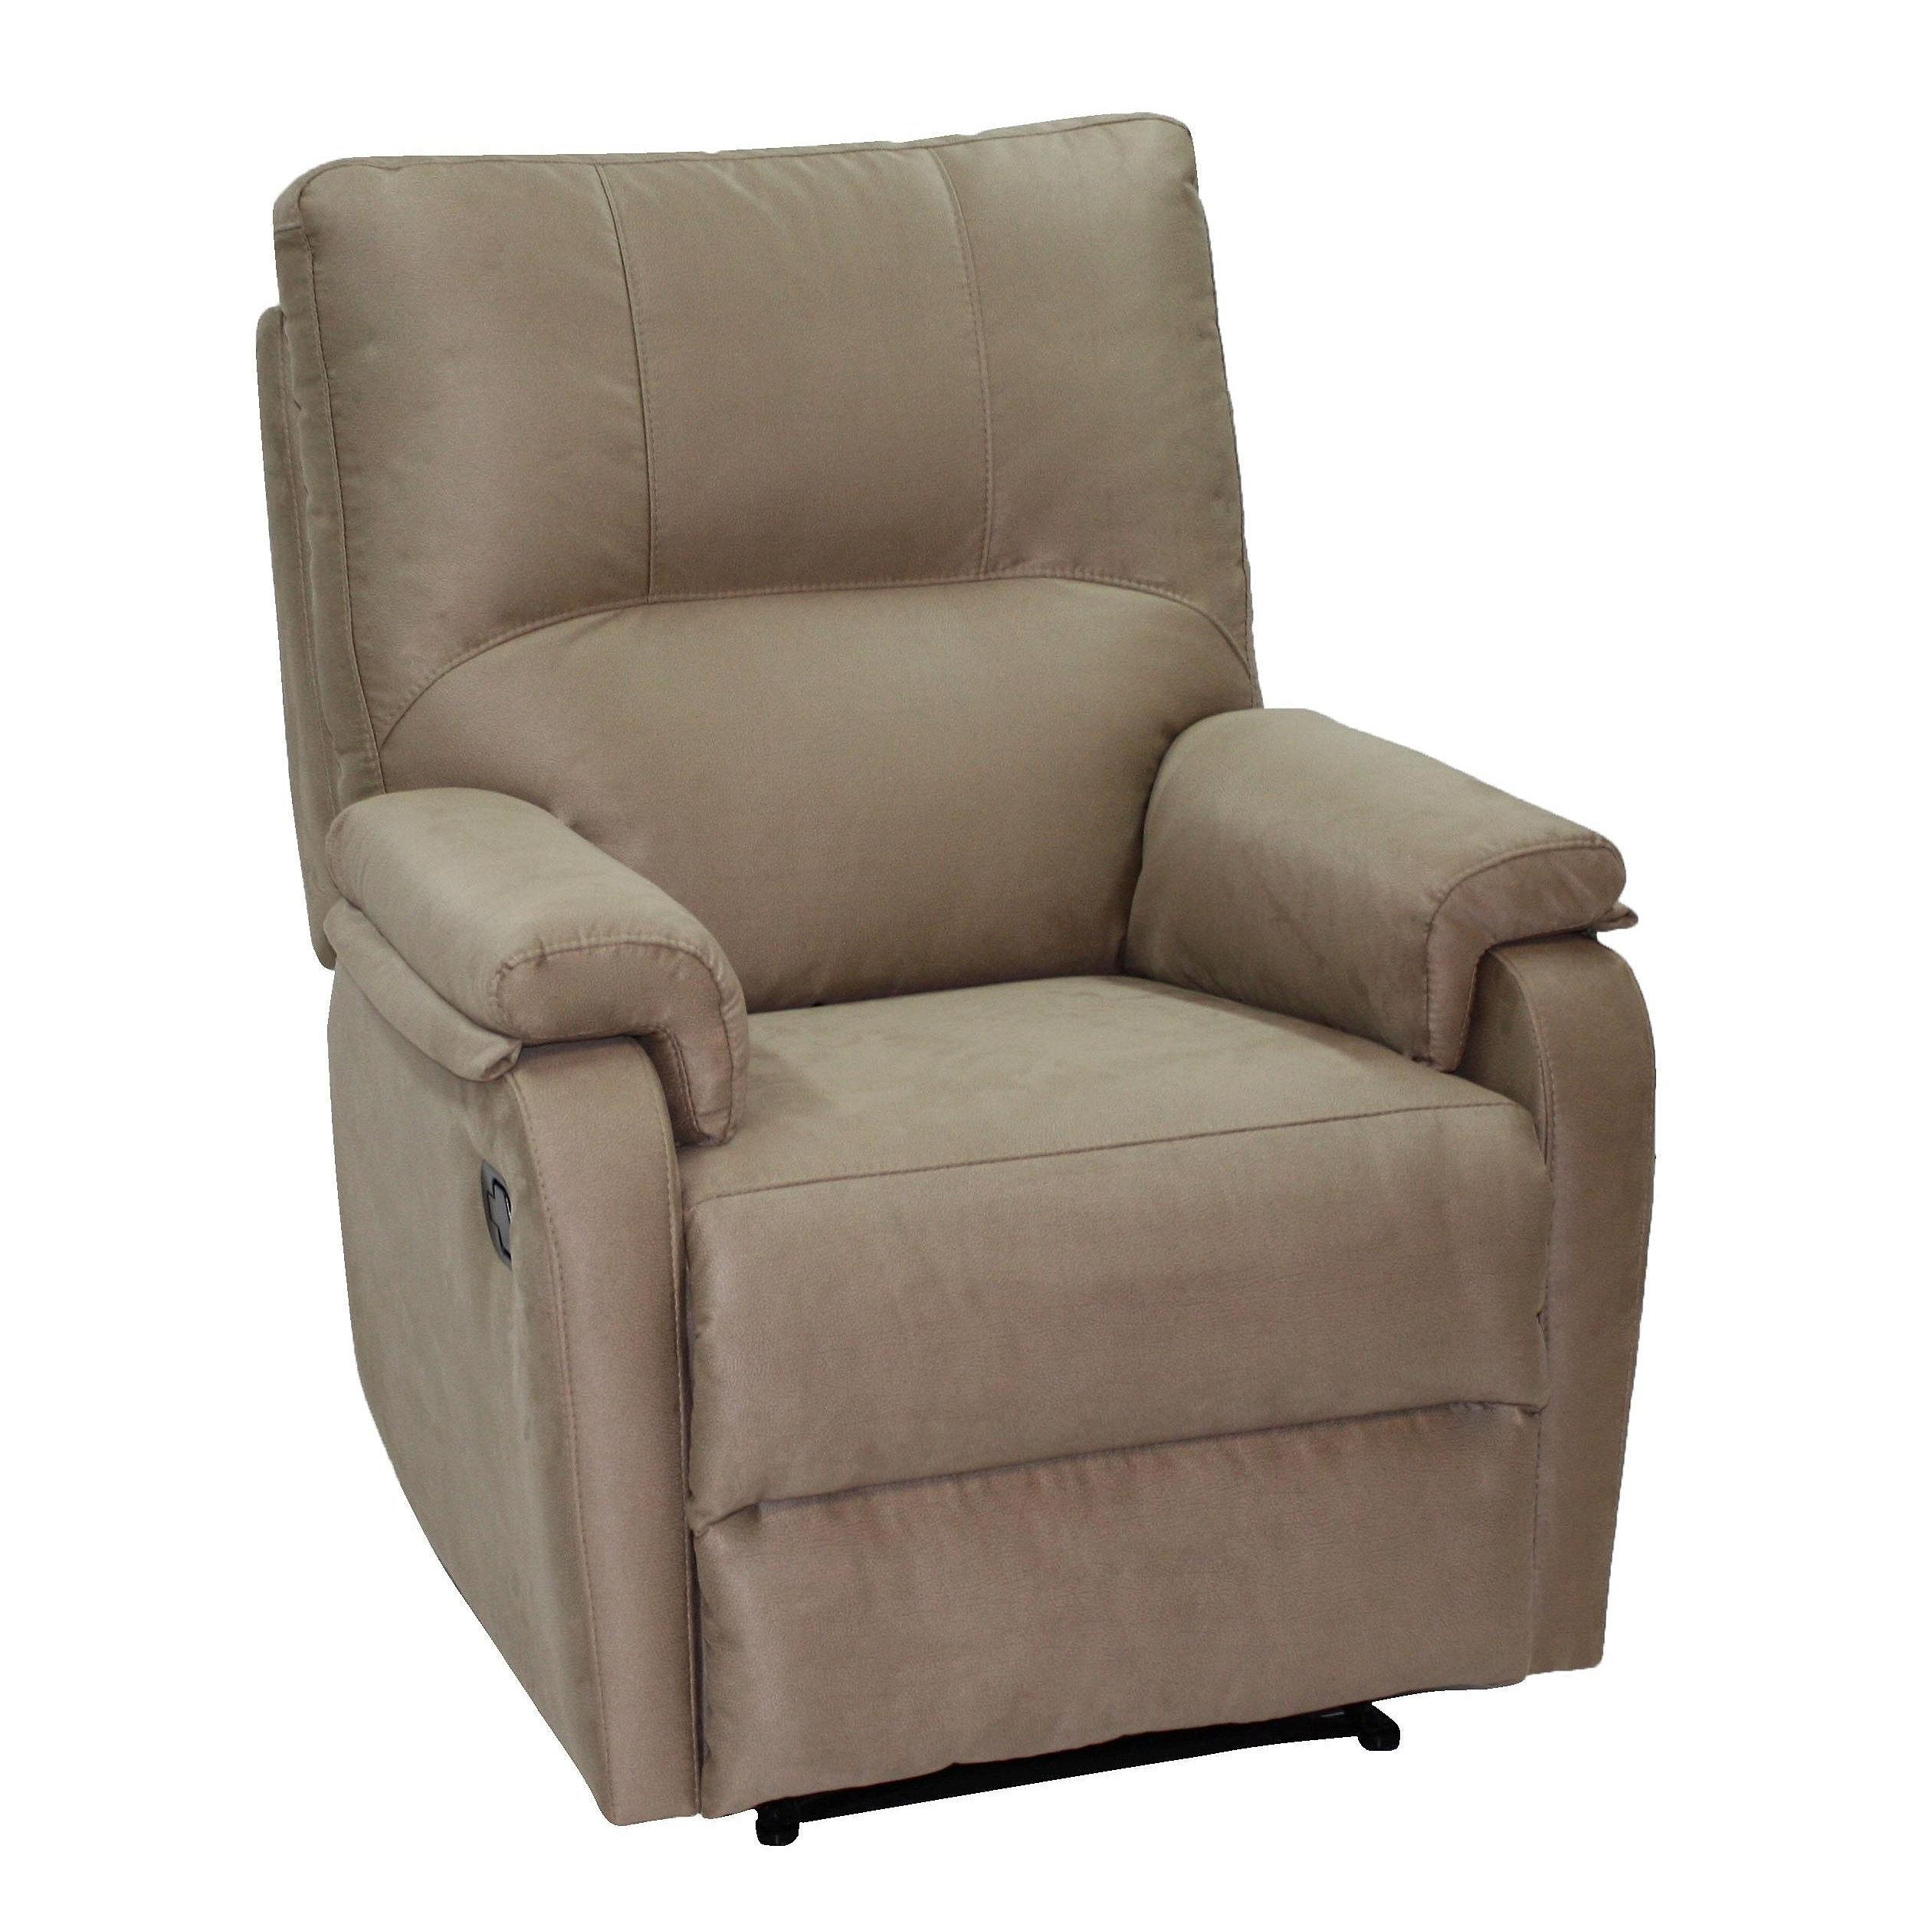 Sofass c diz sof s en c diz and Liner 4 50 x 1 20